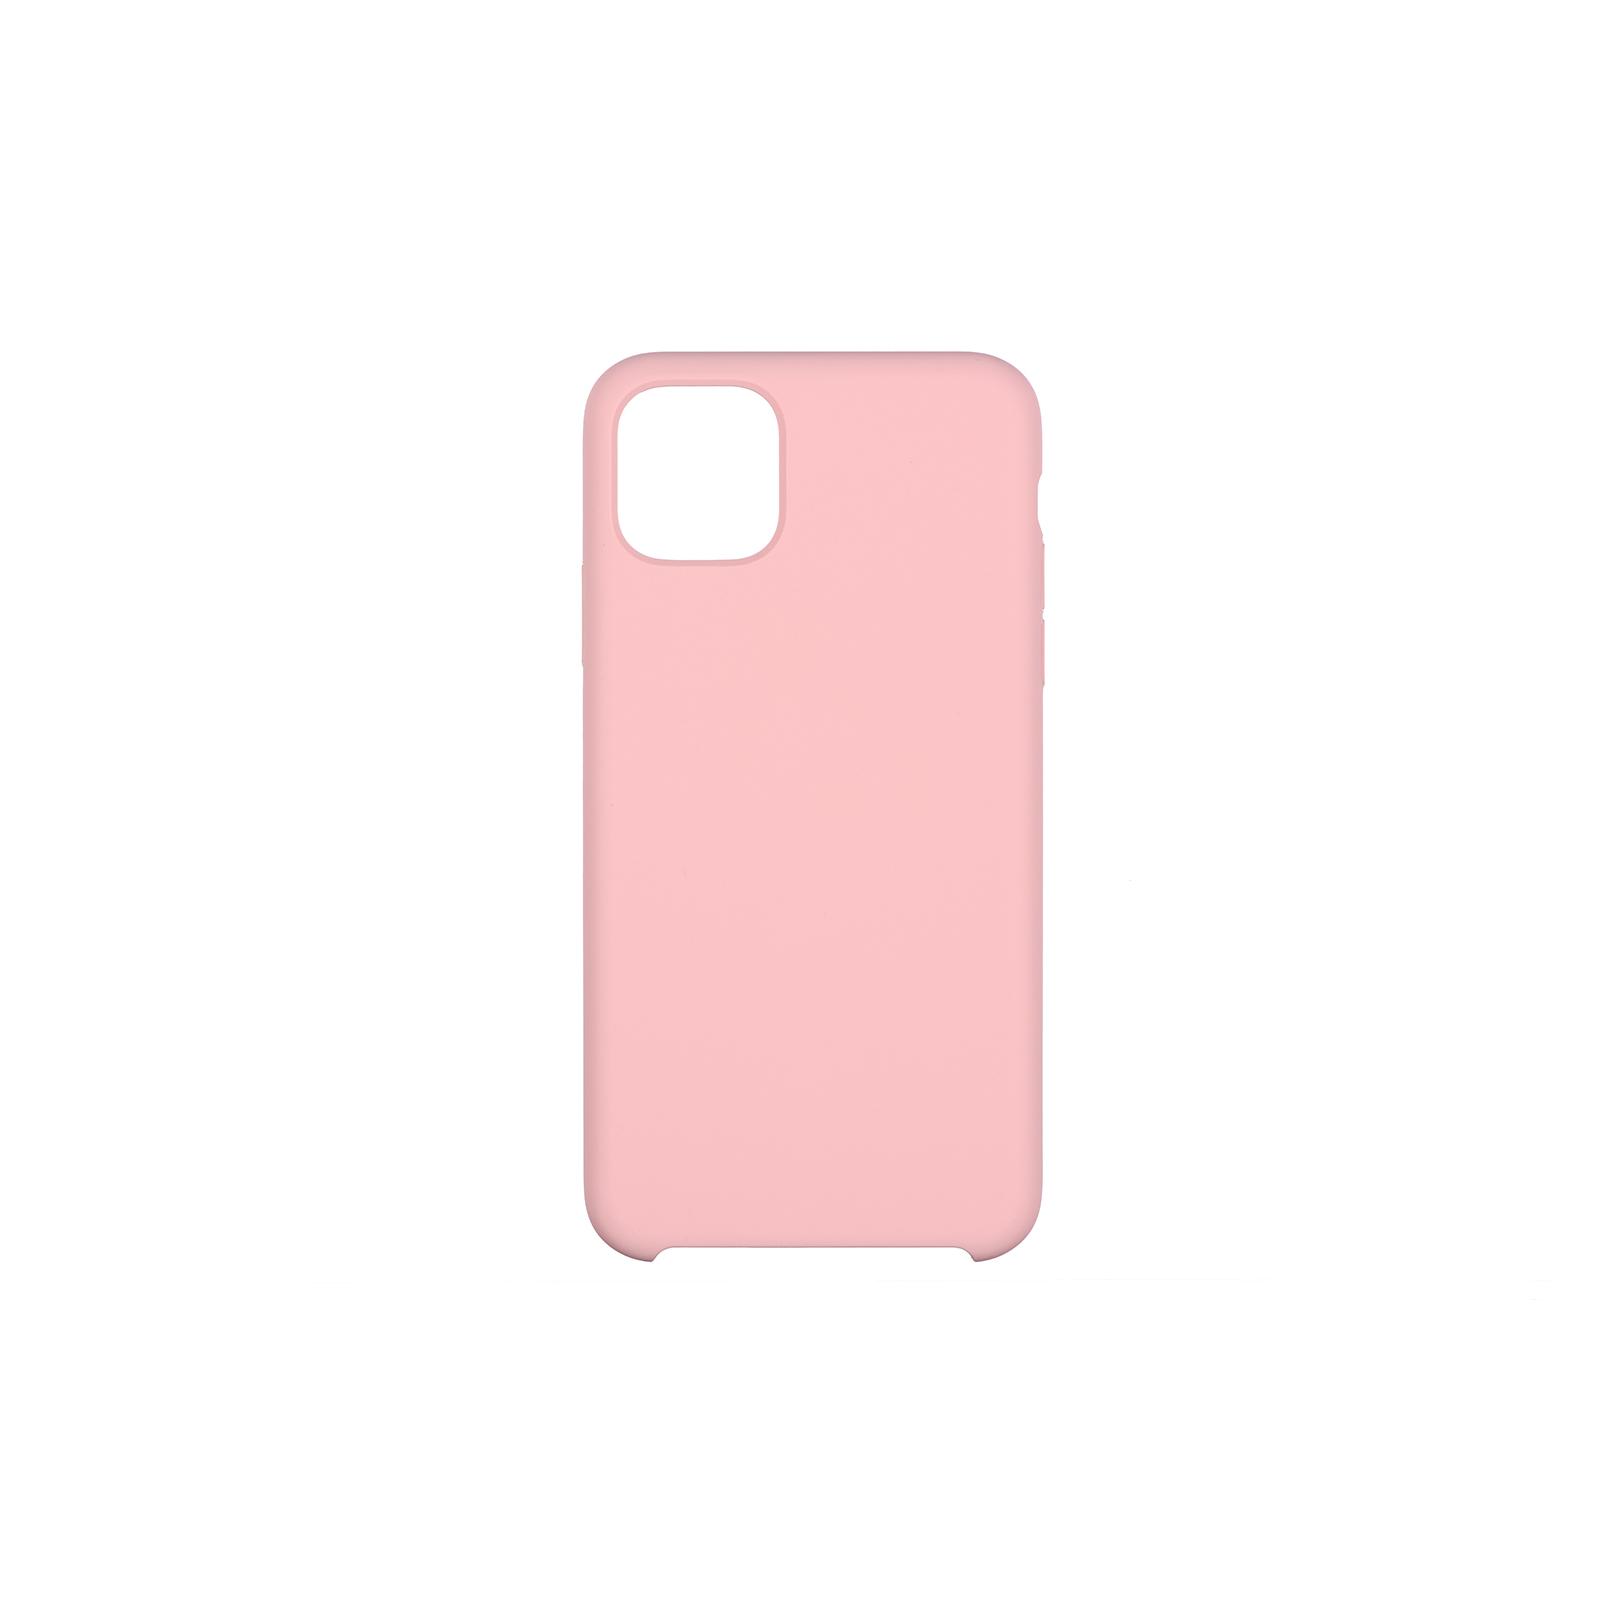 "Чехол для моб. телефона 2E Apple iPhone 11 Pro Max (6.5""), Liquid Silicone, Pink (2E-IPH-11PRM-OCLS-PK)"